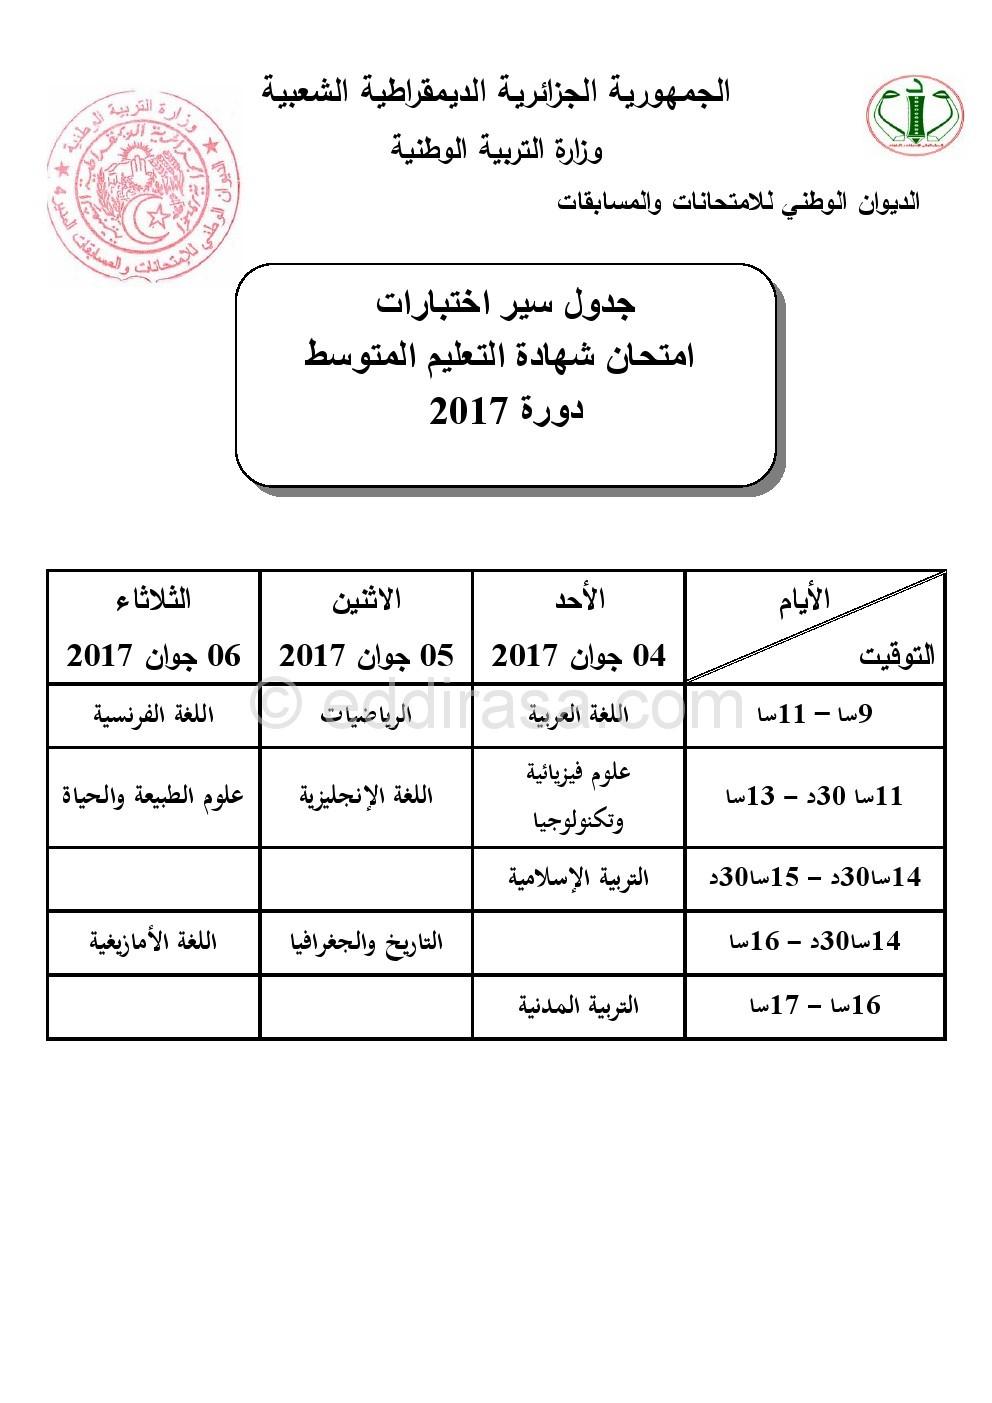 Programme rencontres brel 2017